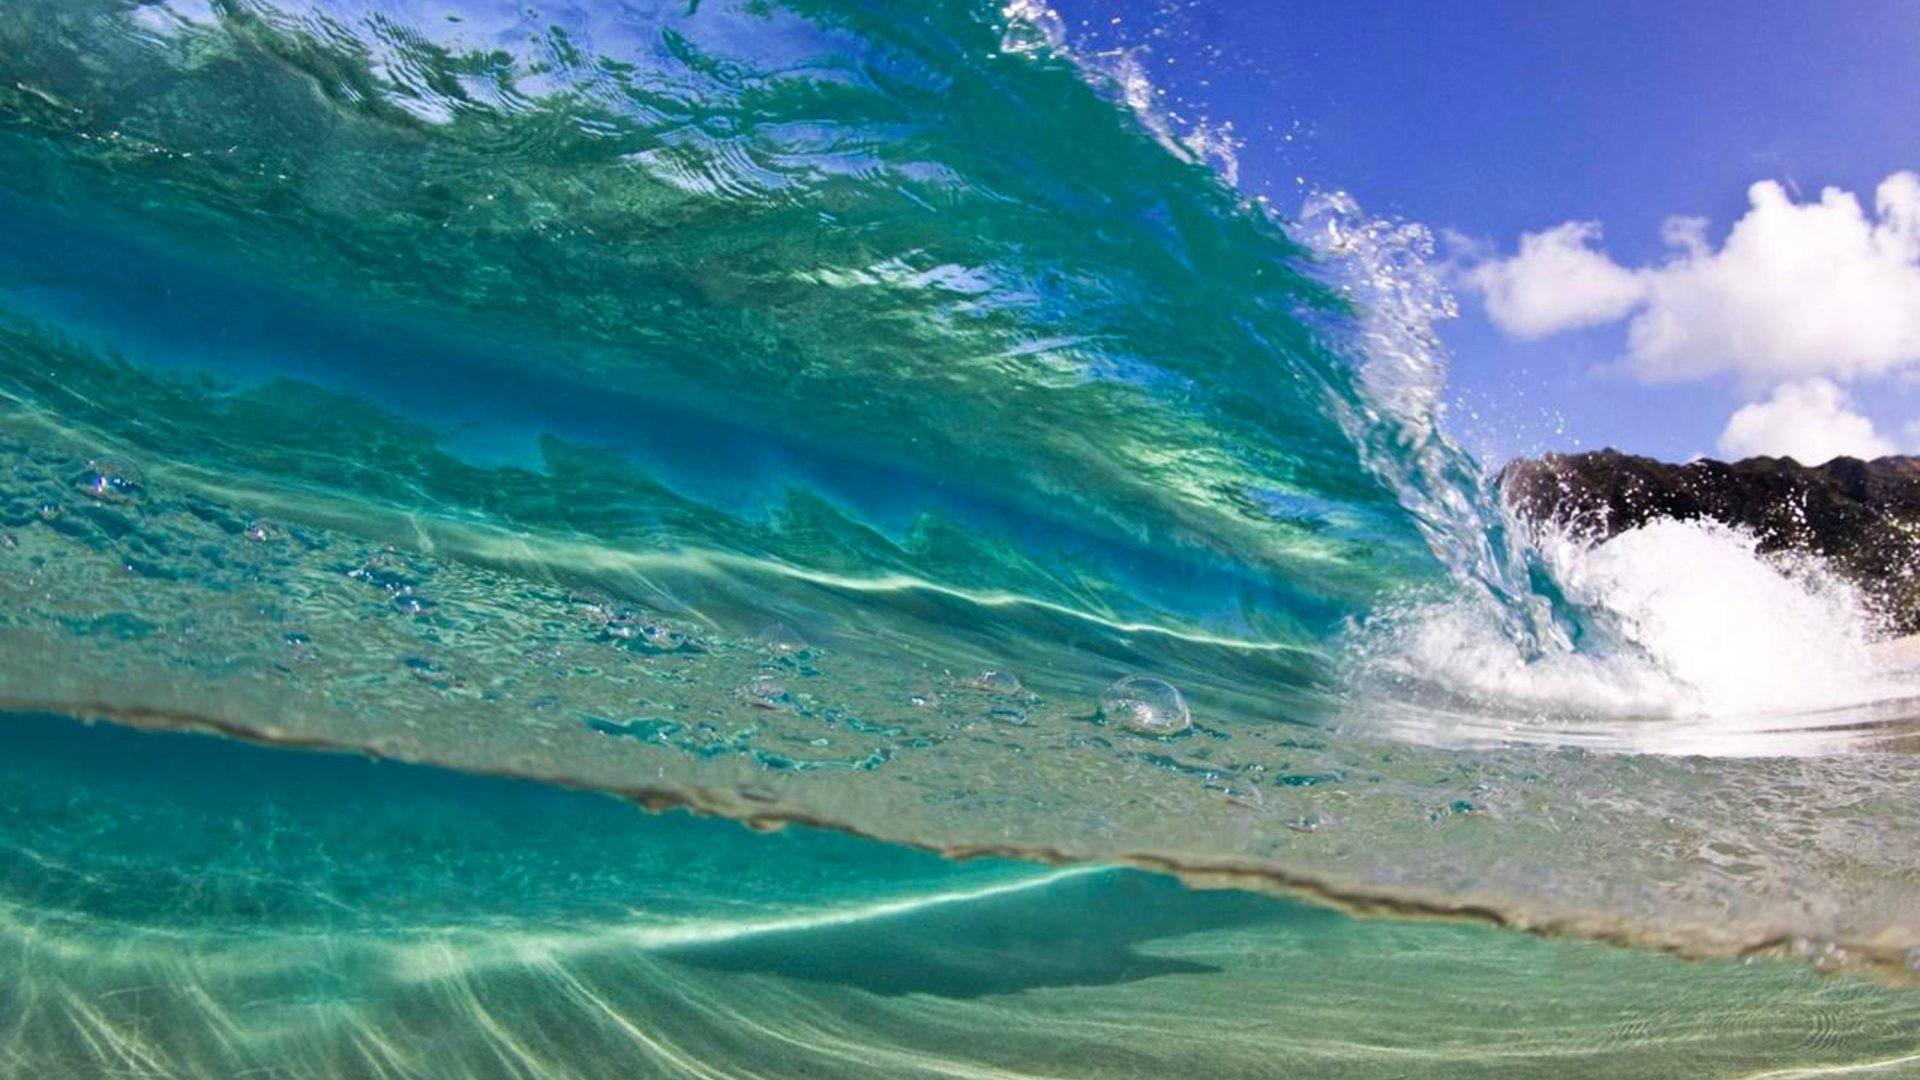 Hawaii Ocean Wallpaper (45+ images)